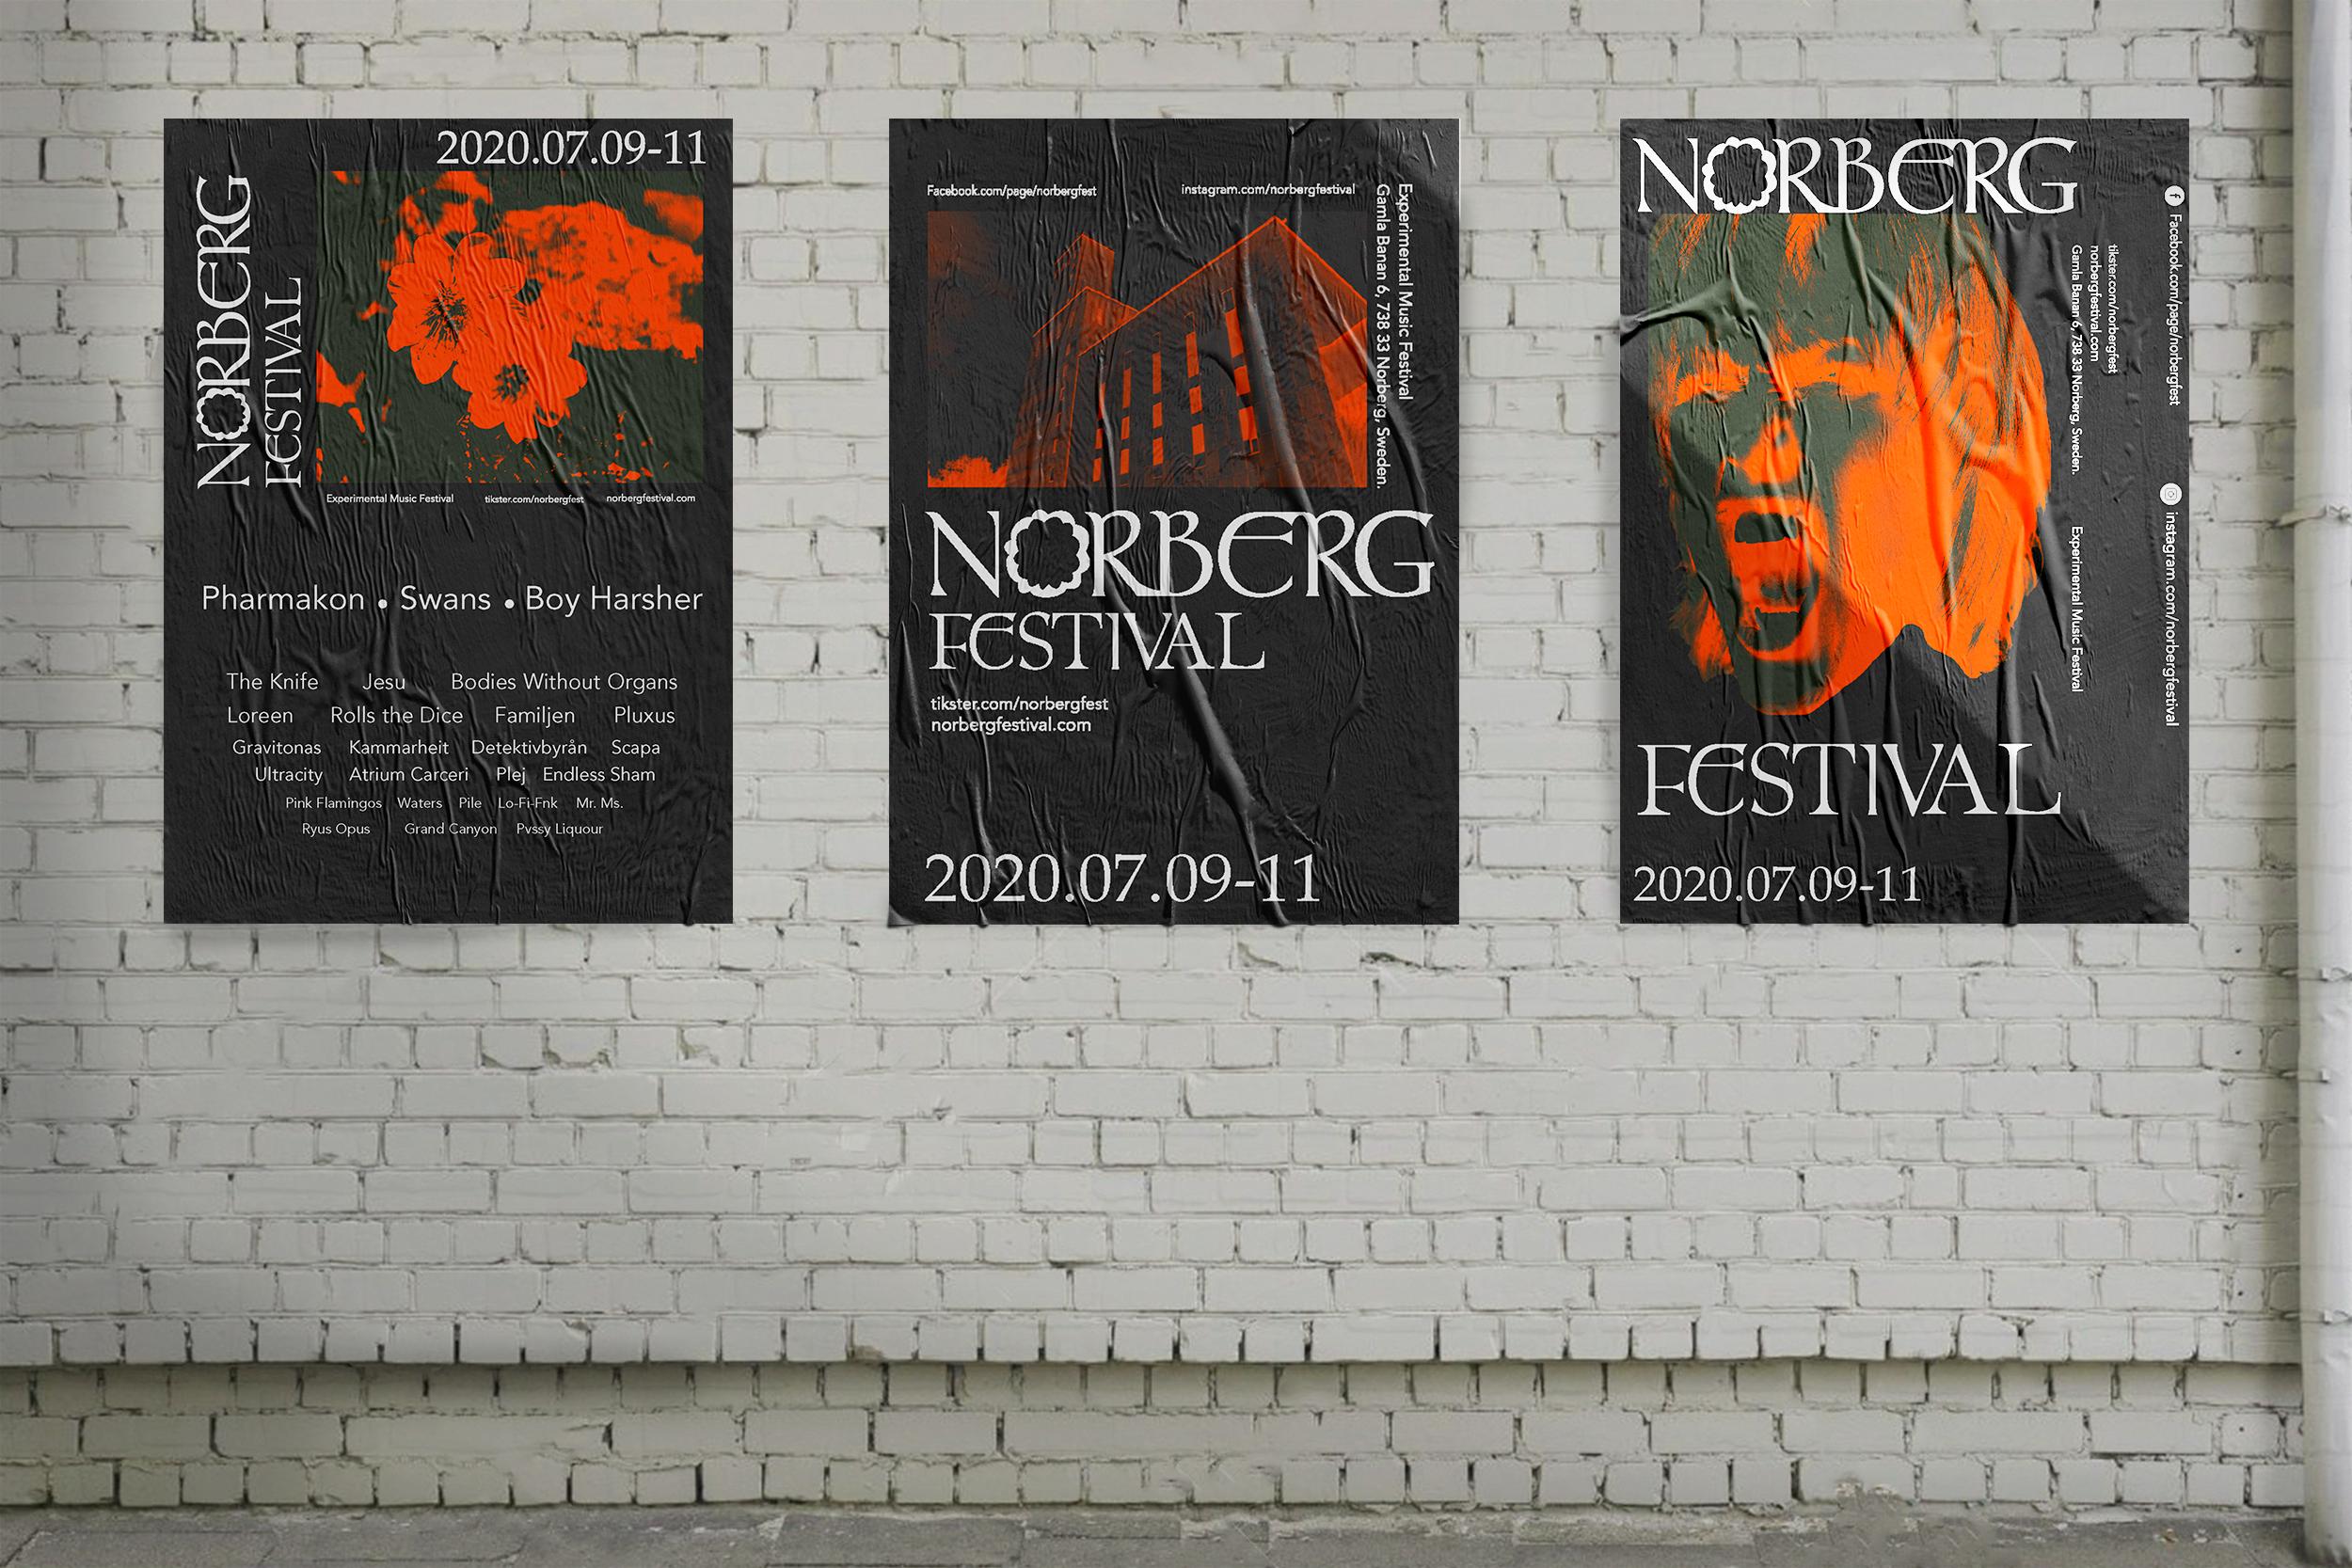 http://Norbergfestival%20Branding